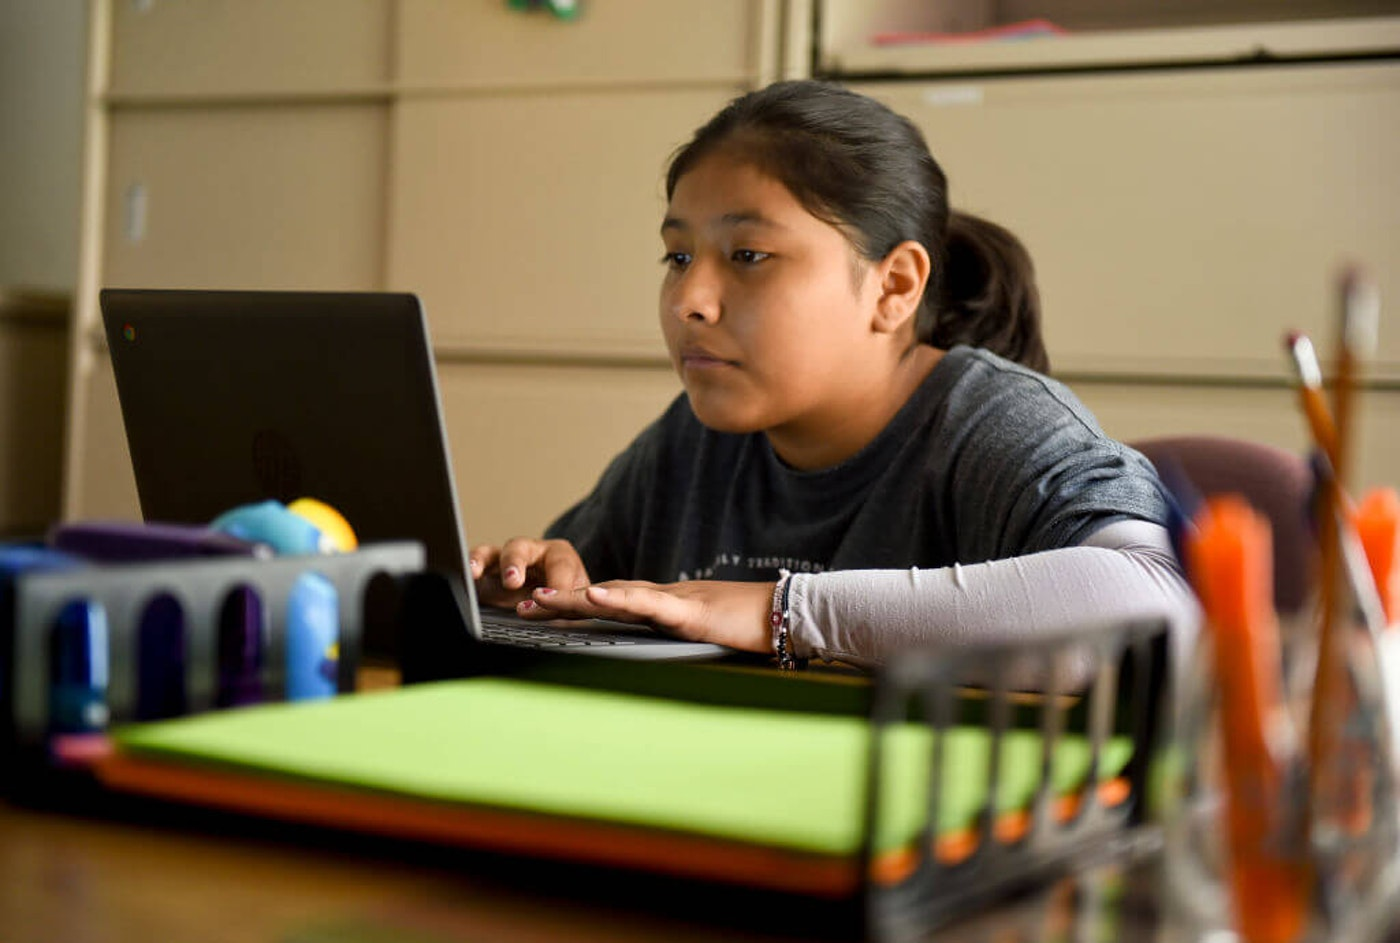 Student attending virtual school